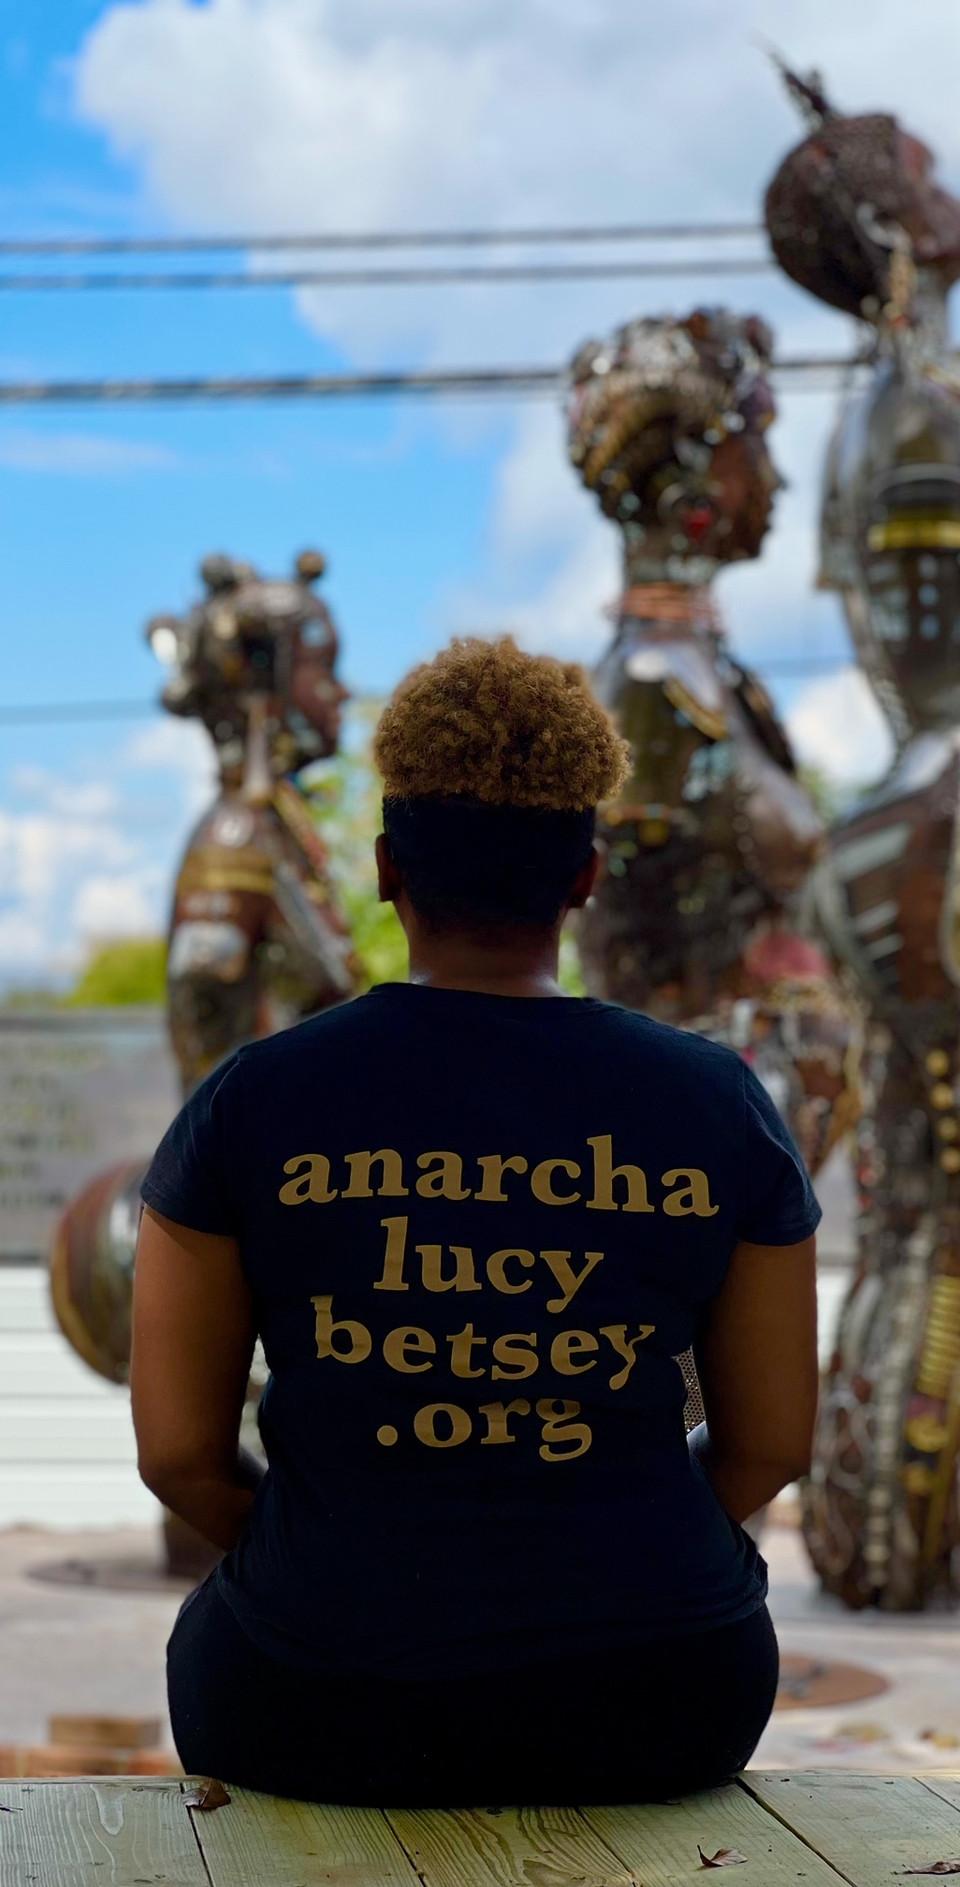 Anarcha, Lucy & Betsey